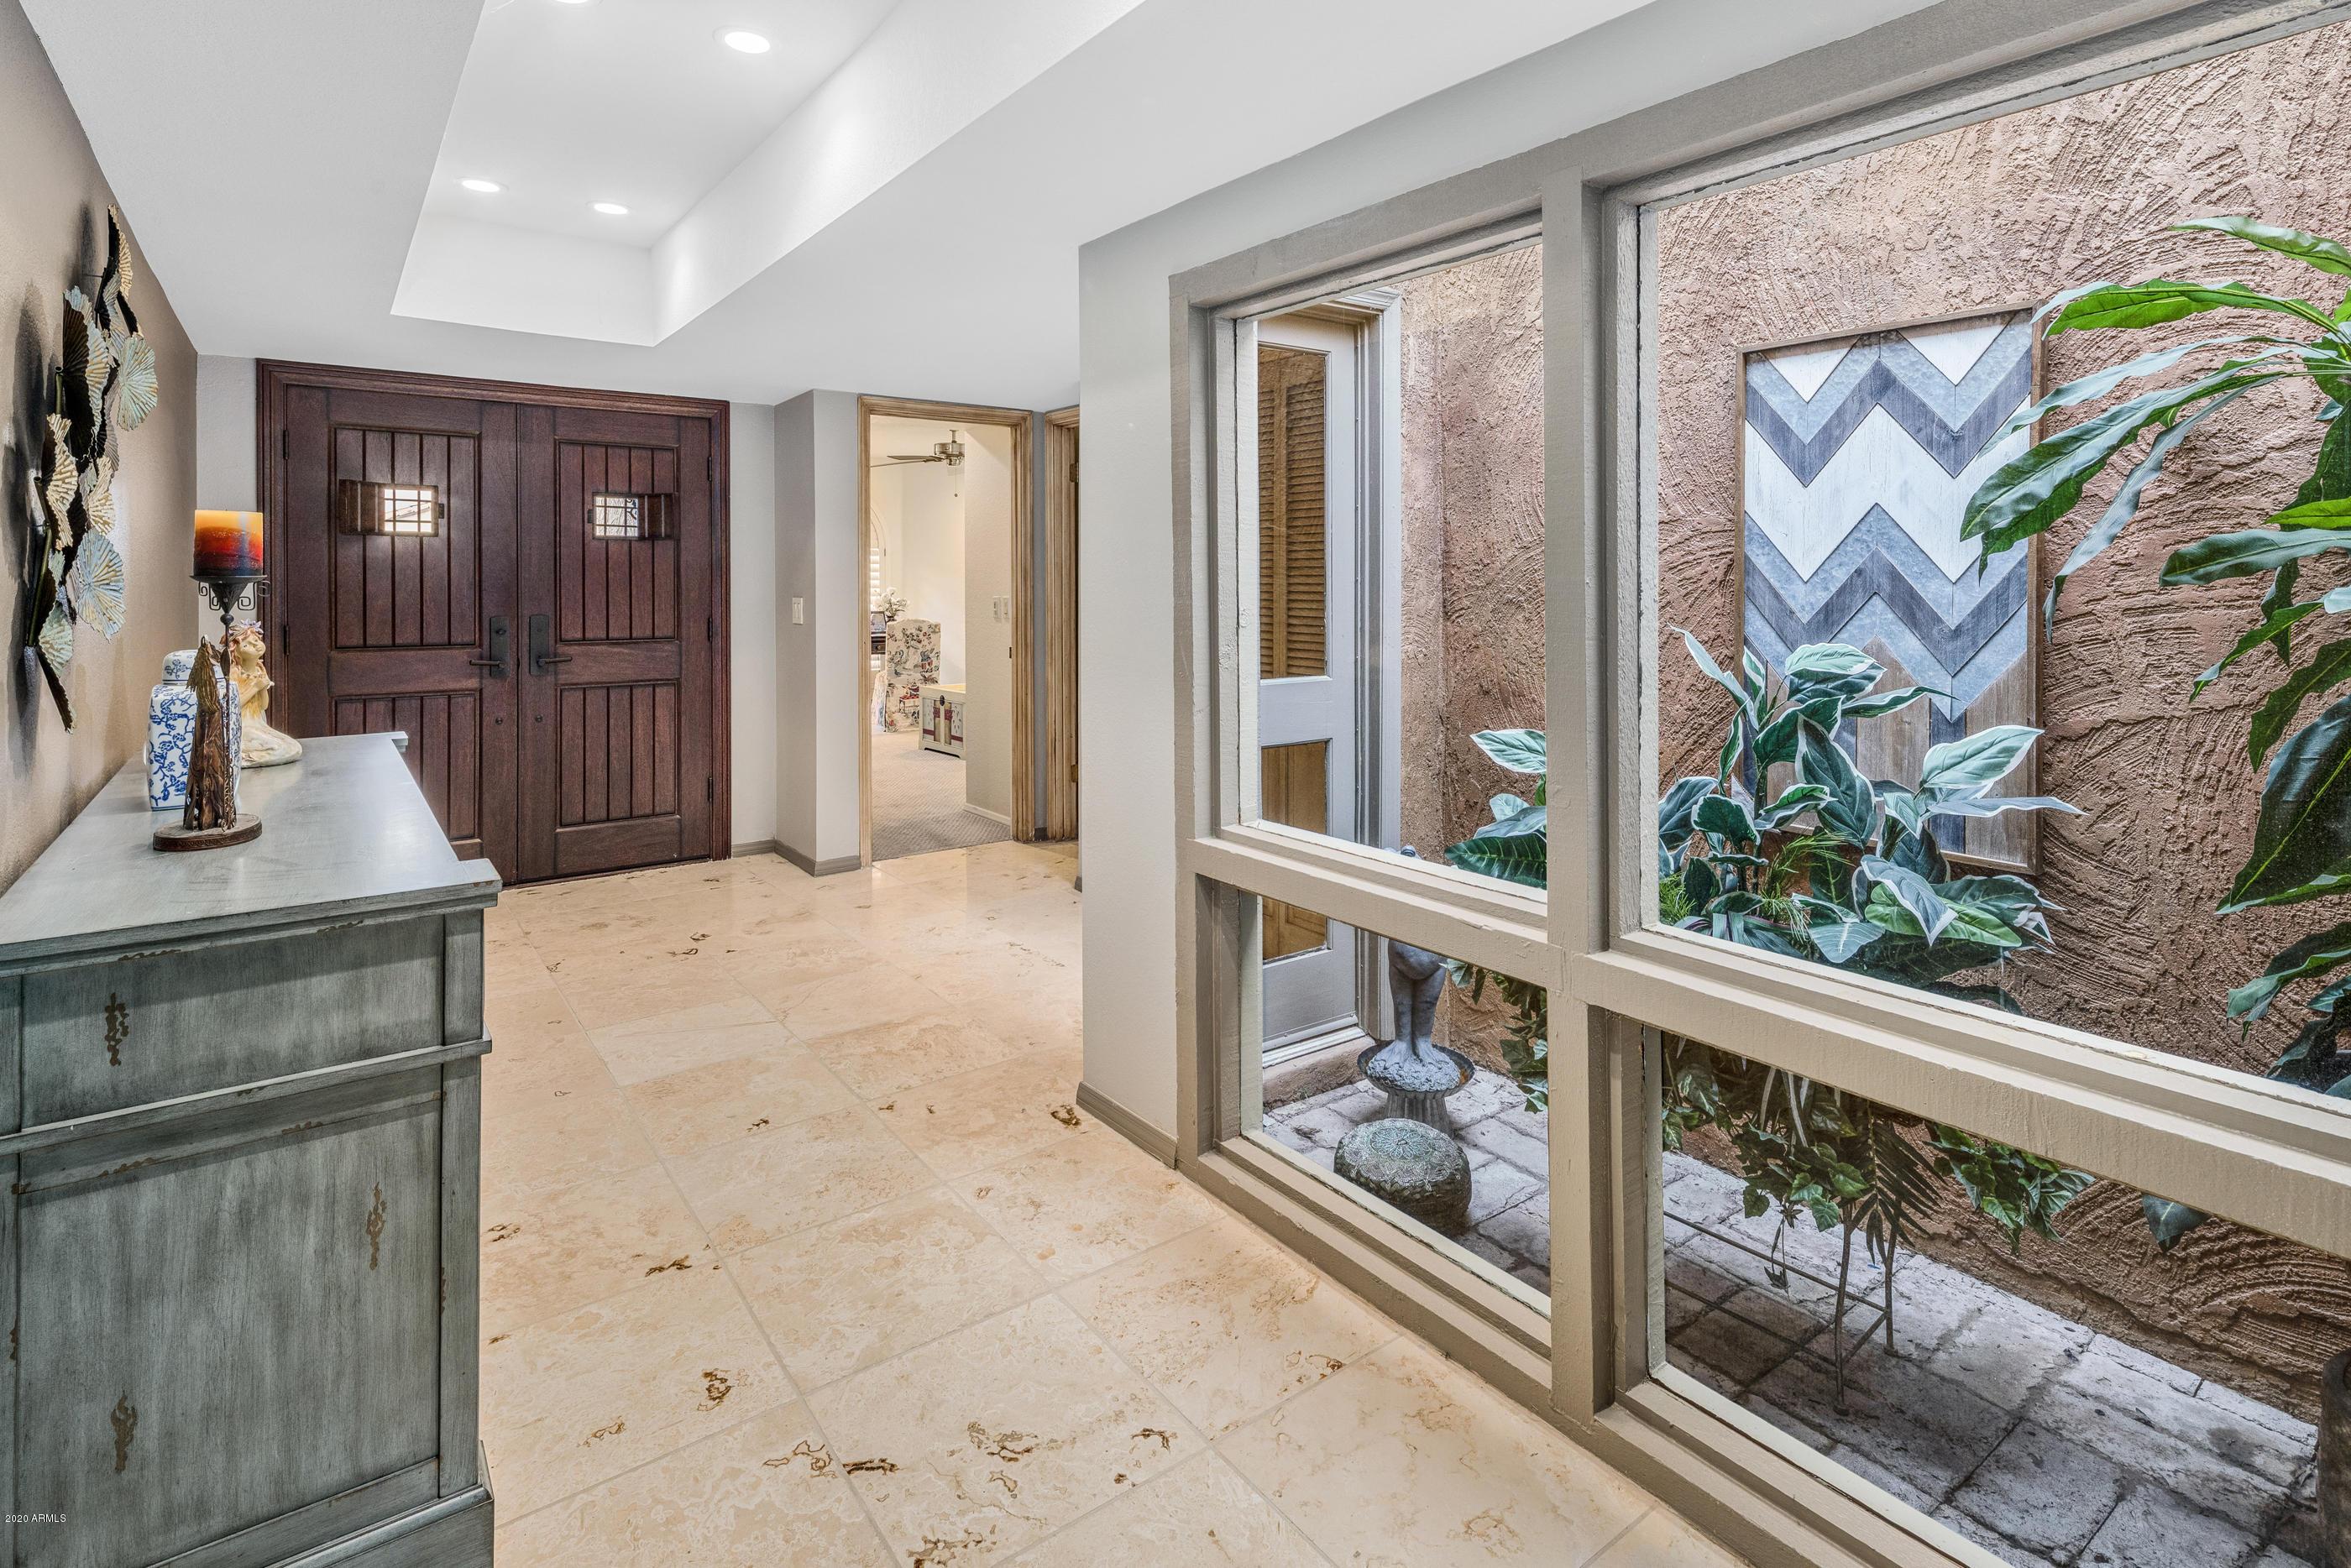 VIA DEL VALLE Road, Scottsdale, Arizona 85258, 2 Bedrooms Bedrooms, ,2 BathroomsBathrooms,Residential,For Sale,VIA DEL VALLE,6118821